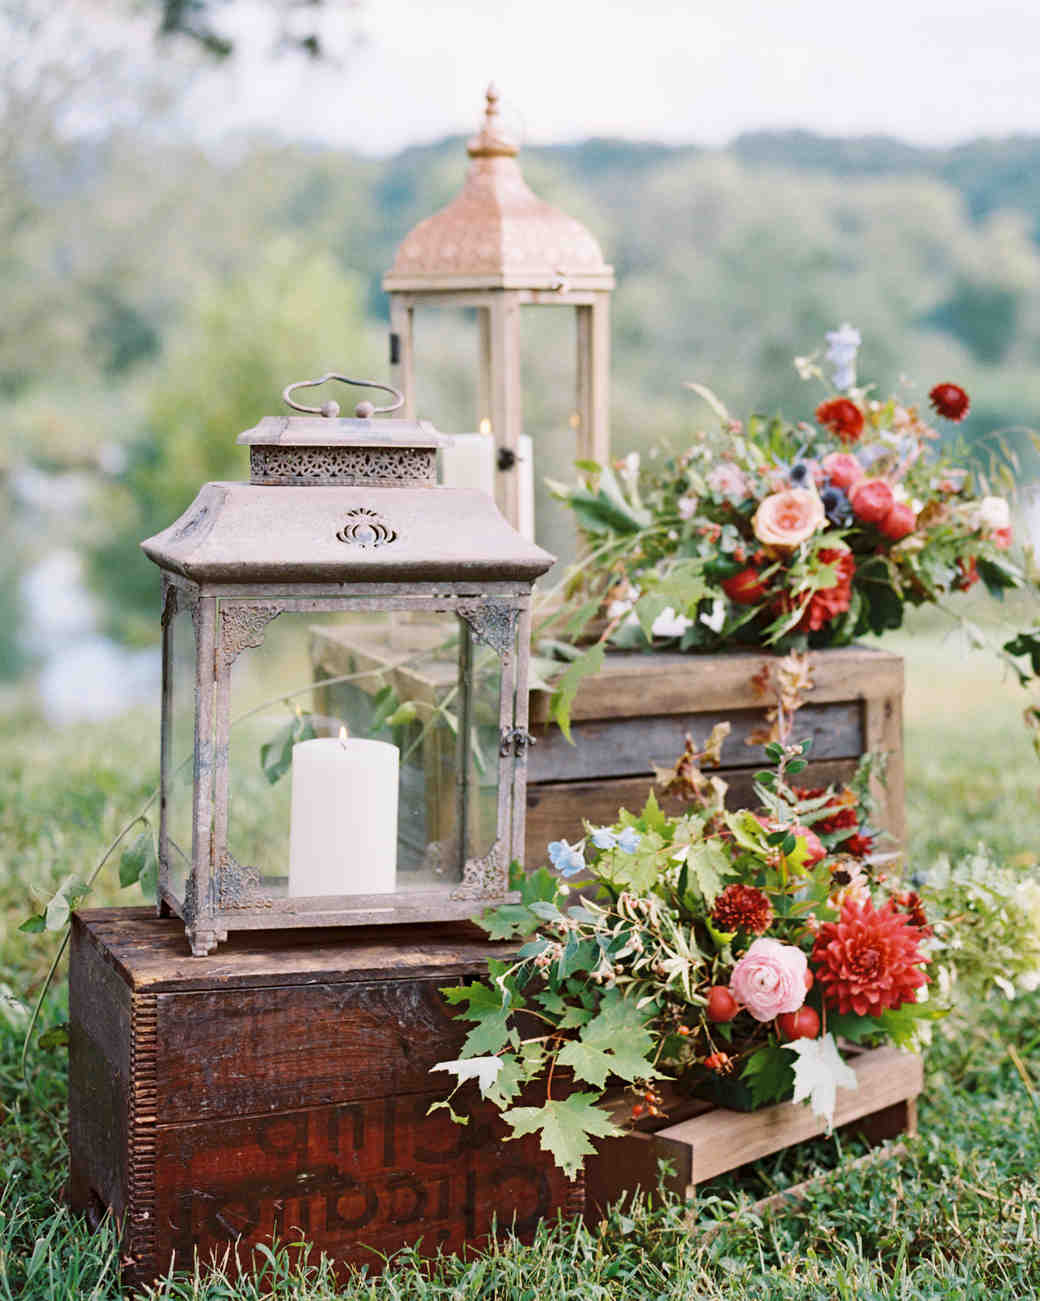 michelle-john-wedding-north-carolina-8-s111840-0215.jpg